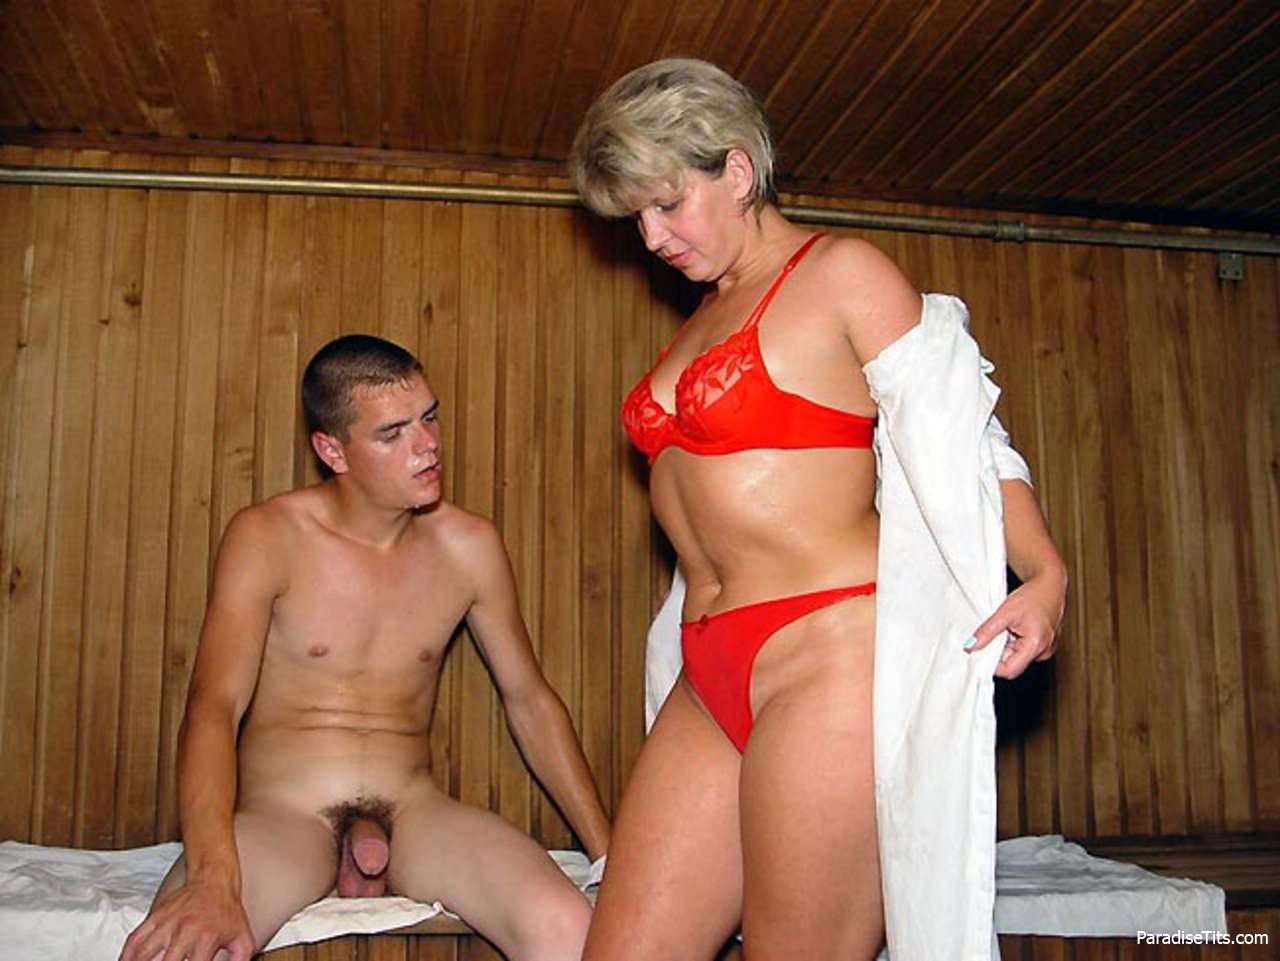 Секс в бане смотрите порно на СексДевок.com